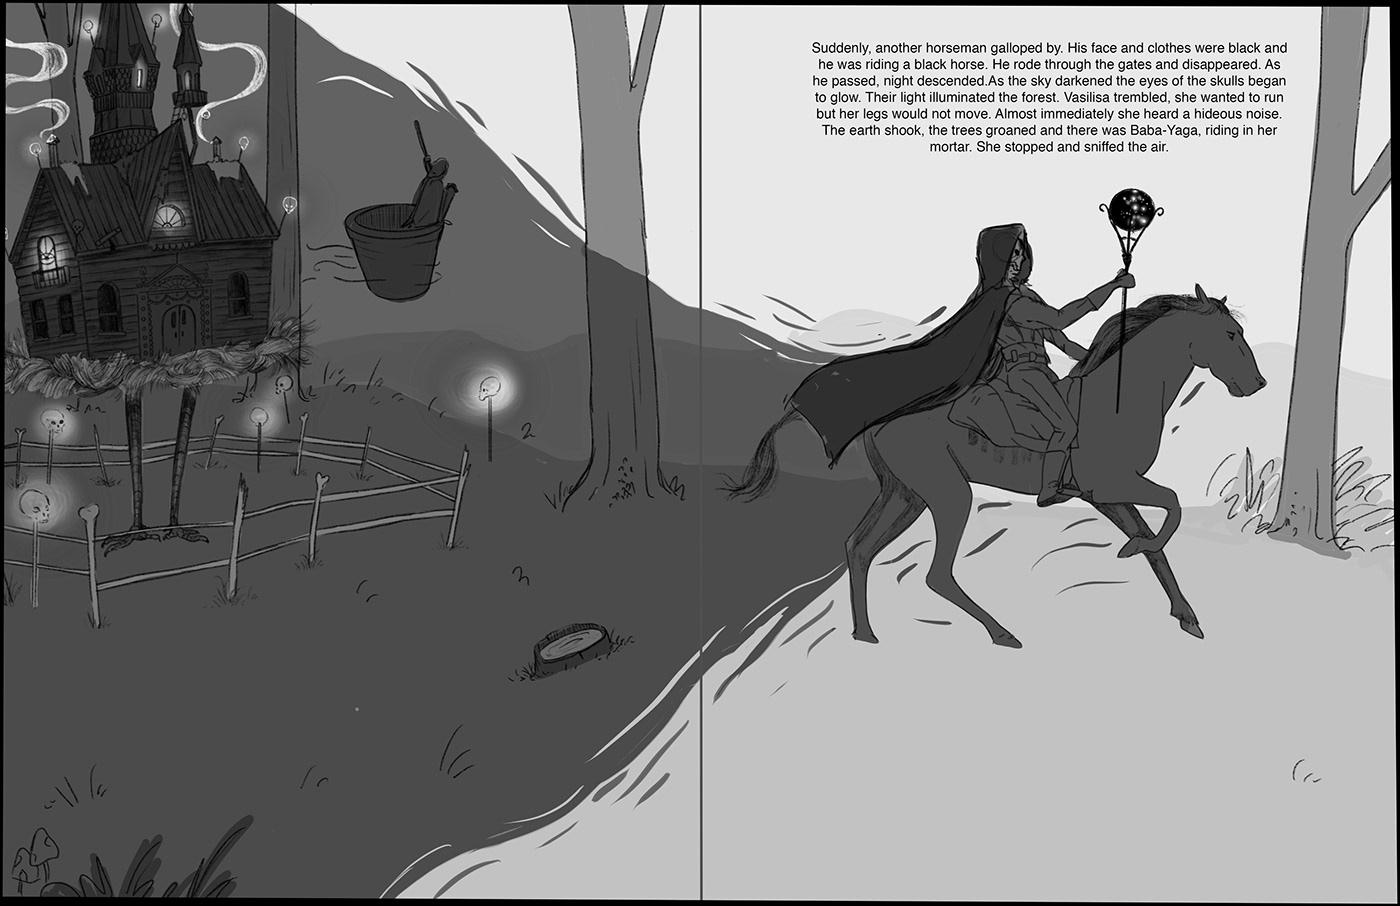 Baba Yaga book illustration children's book fairytale fantasy folk tale russian Vasilisa Middle grade young adult